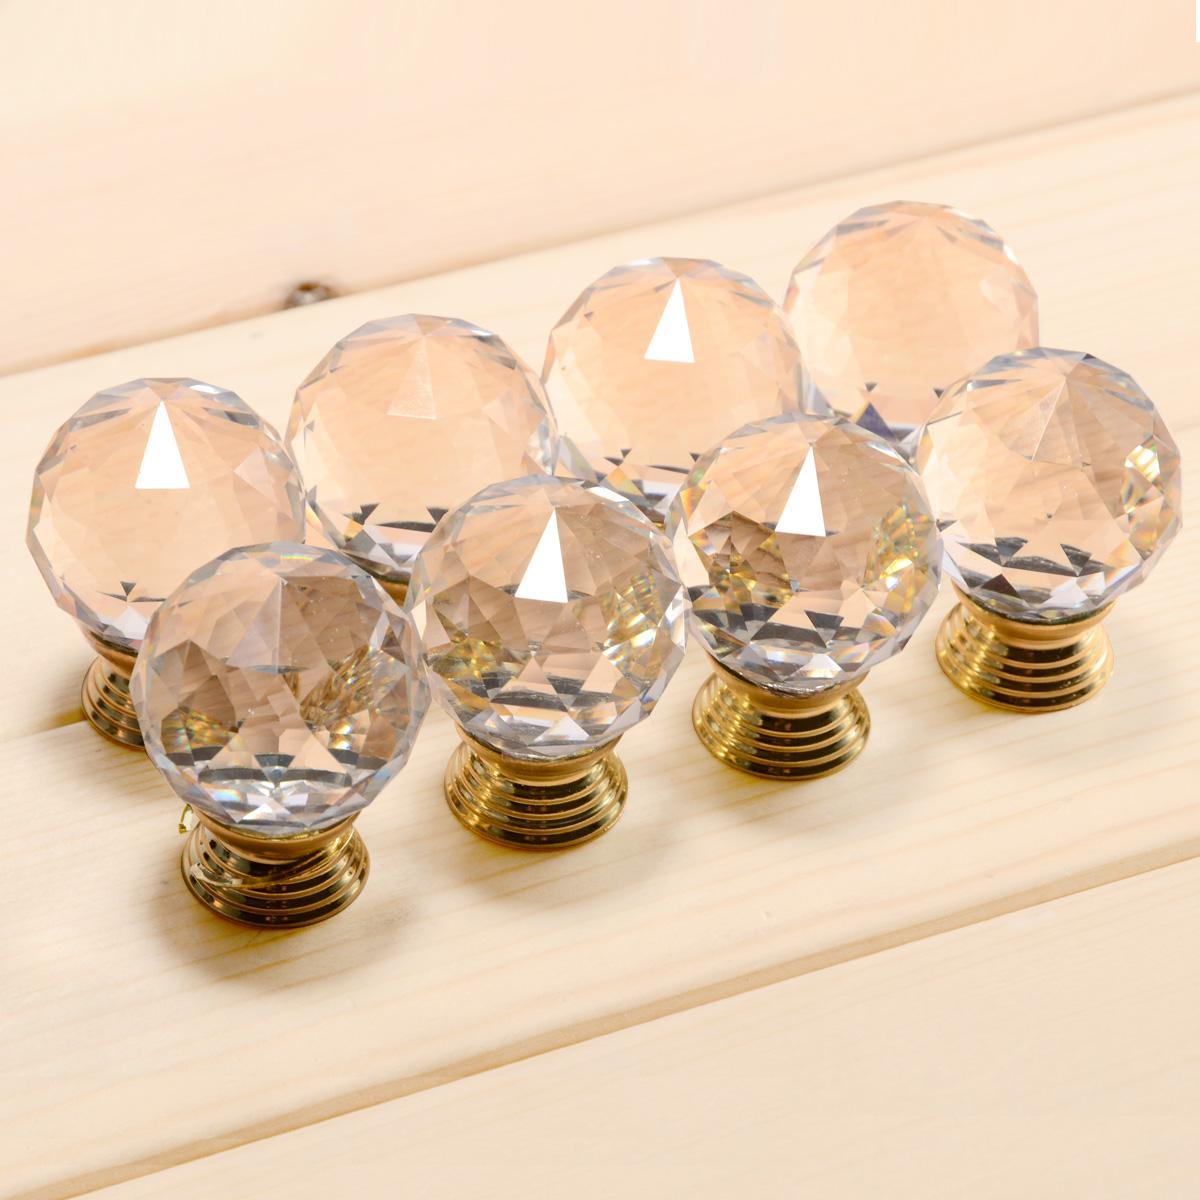 Set de 8pcs pomo de cristal manilla tiradores de mueble - Tiradores de cajones ...